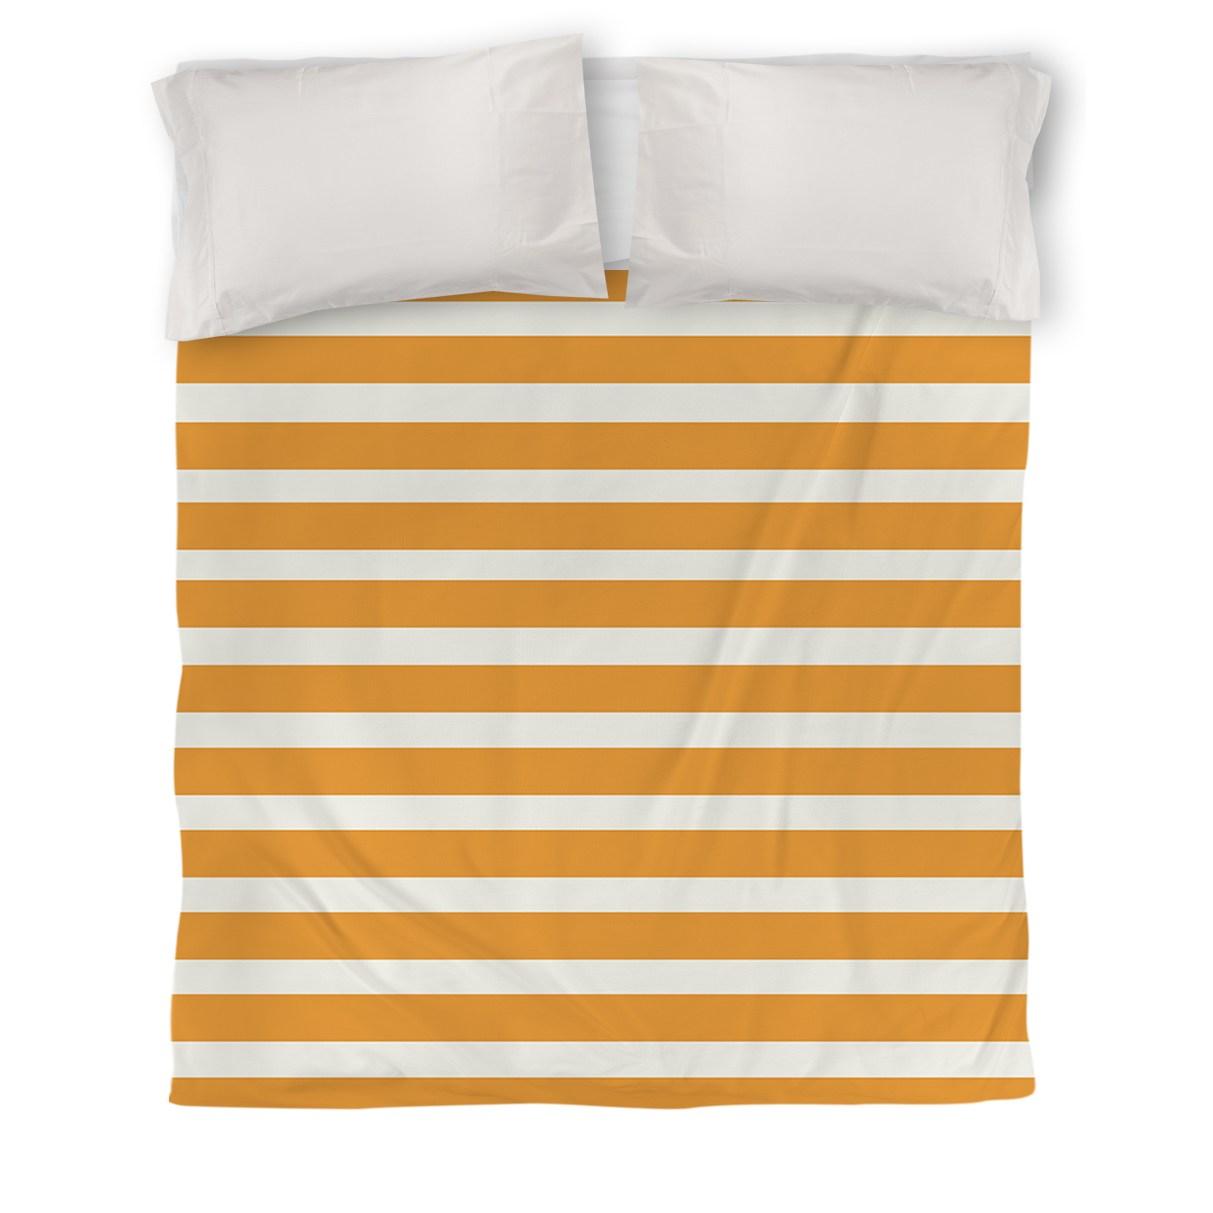 IDG Bright Stripes Duvet Cover, Orange